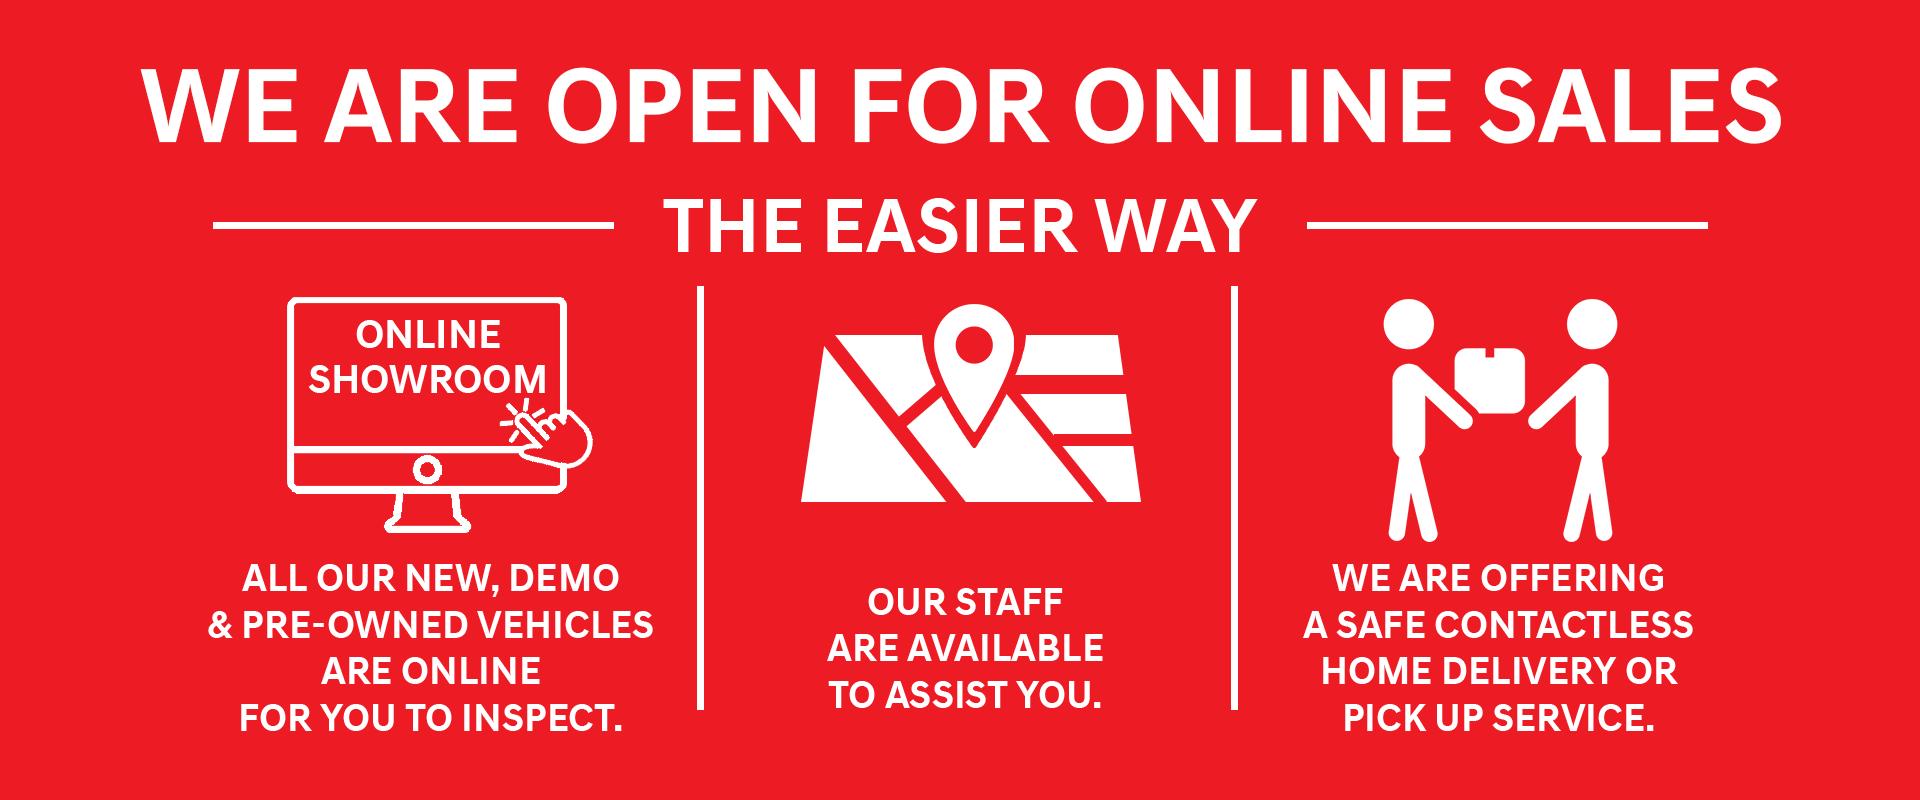 Cranbourne MG - We are open online